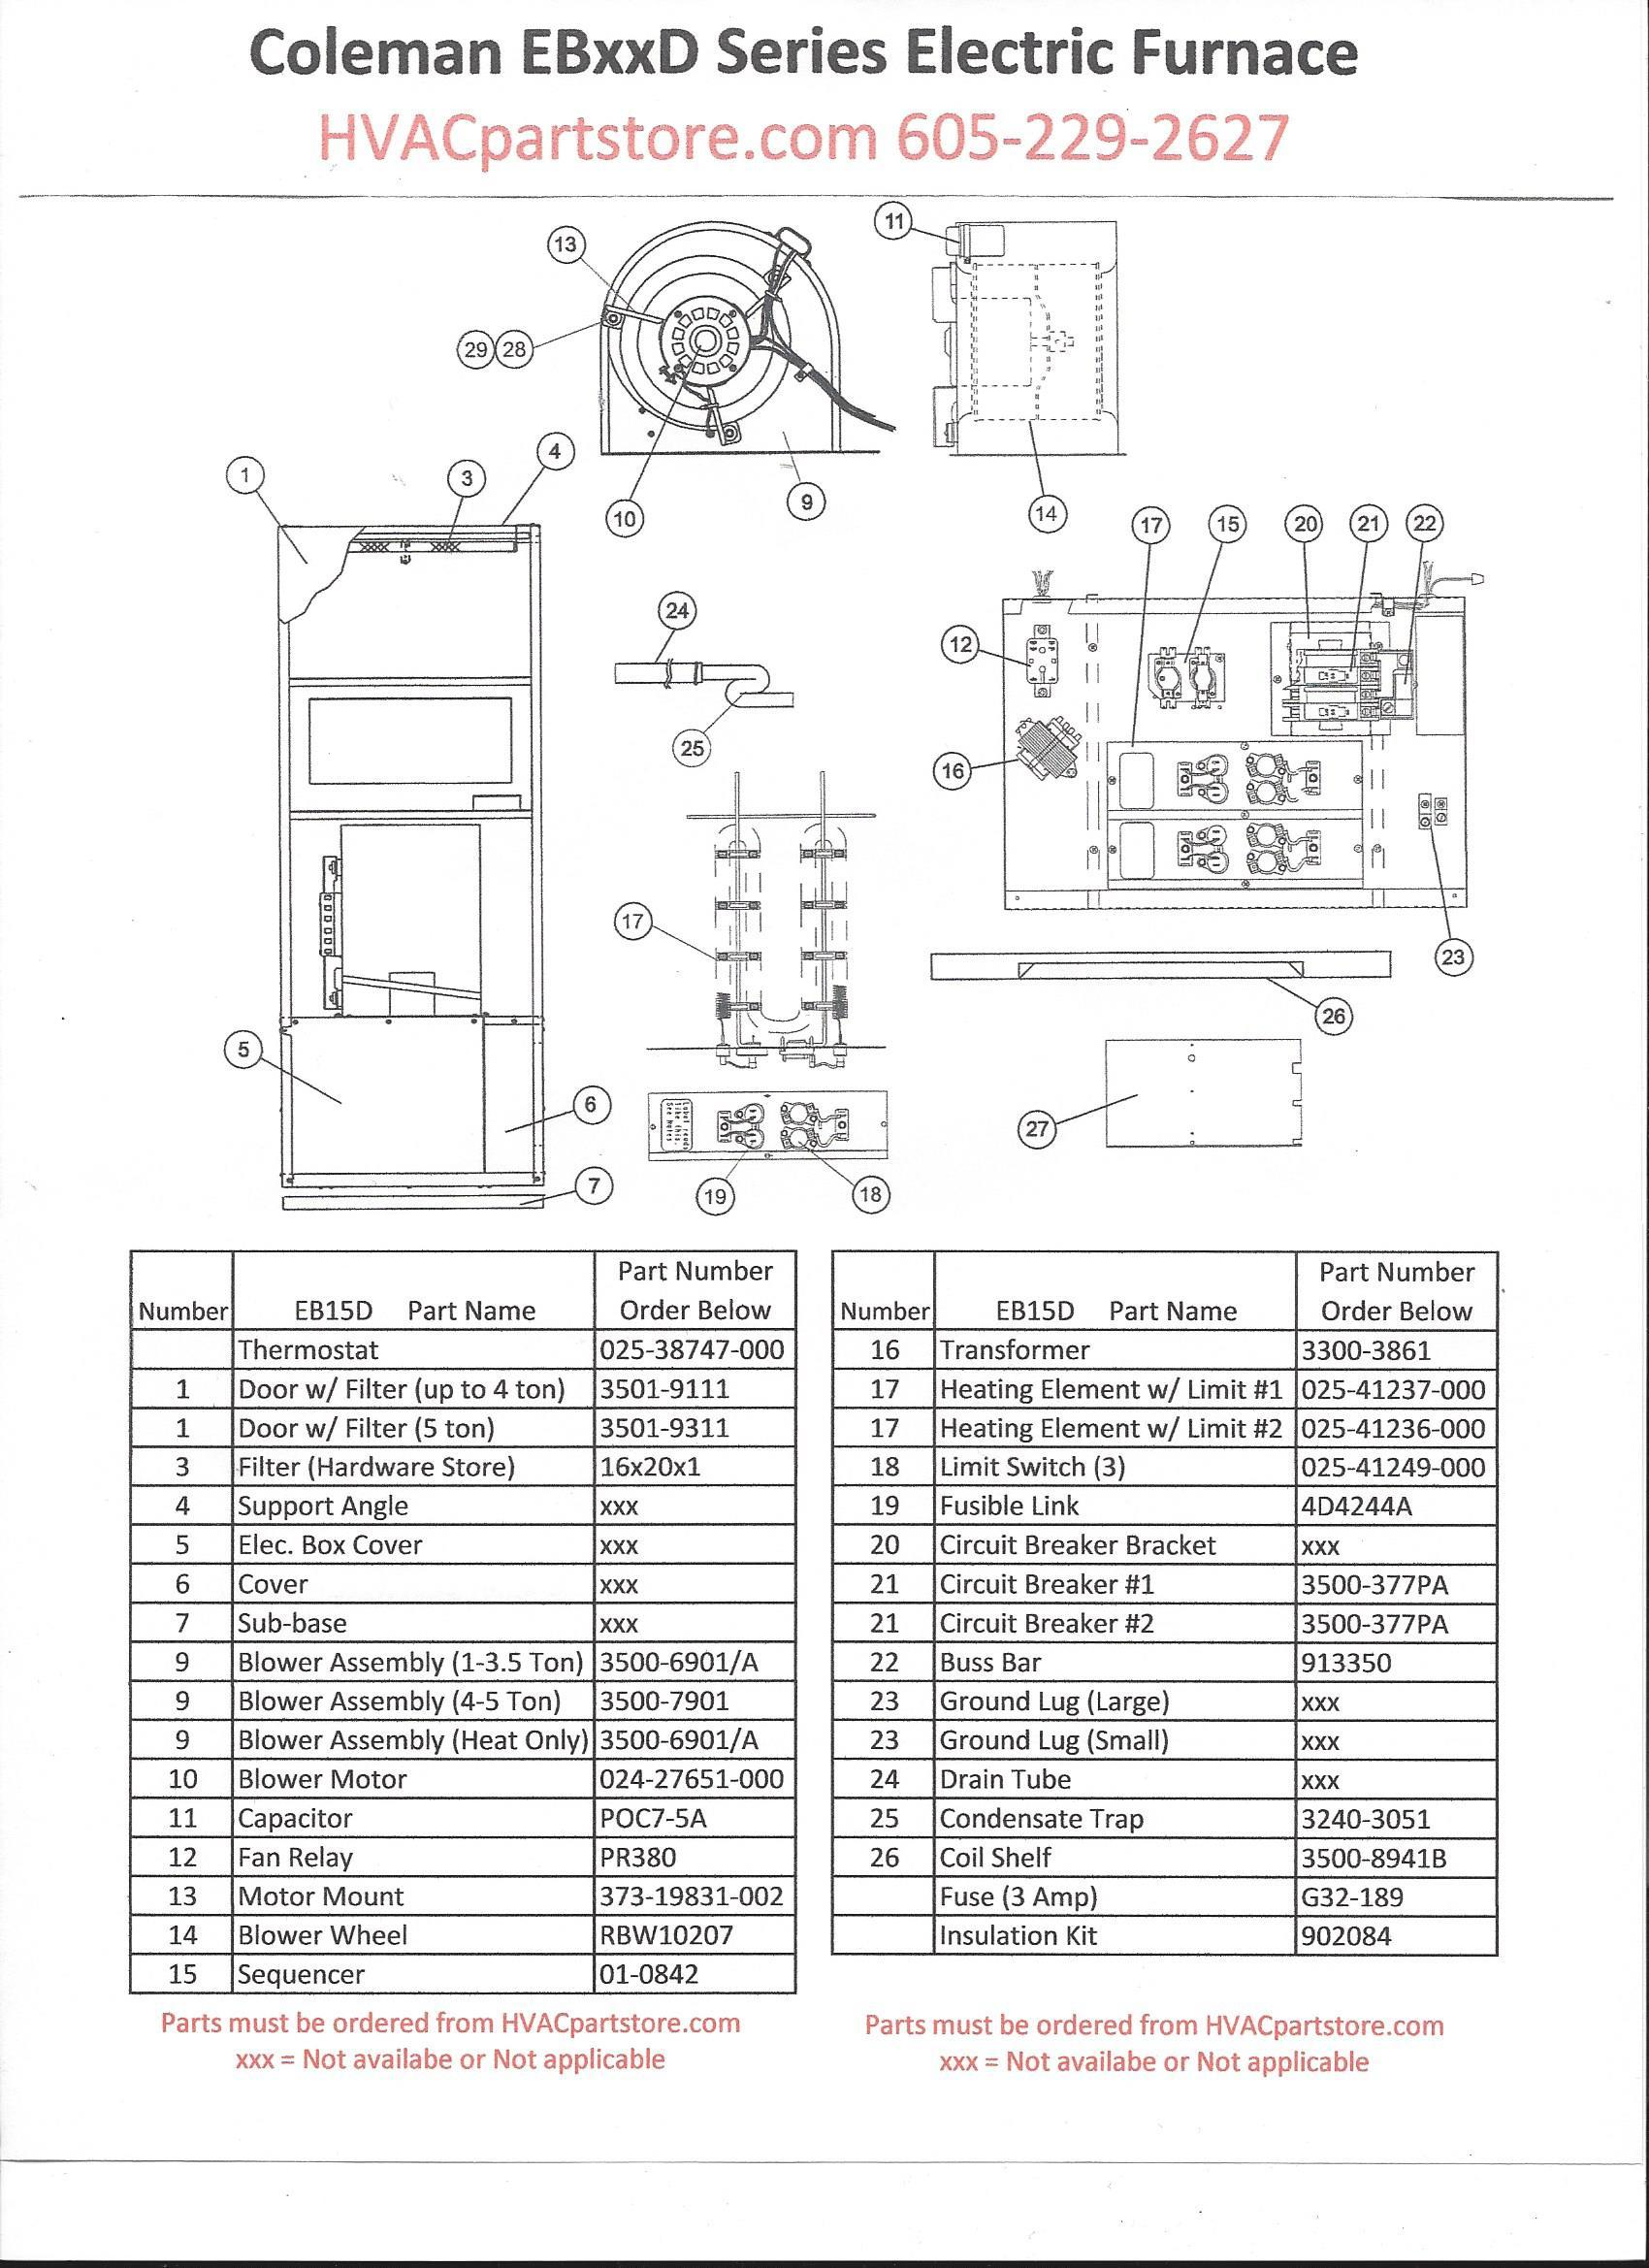 EE_4182] Eb15D Coleman Evcon Wiring Diagram Schematic WiringCette Sequ Dome Mohammedshrine Librar Wiring 101